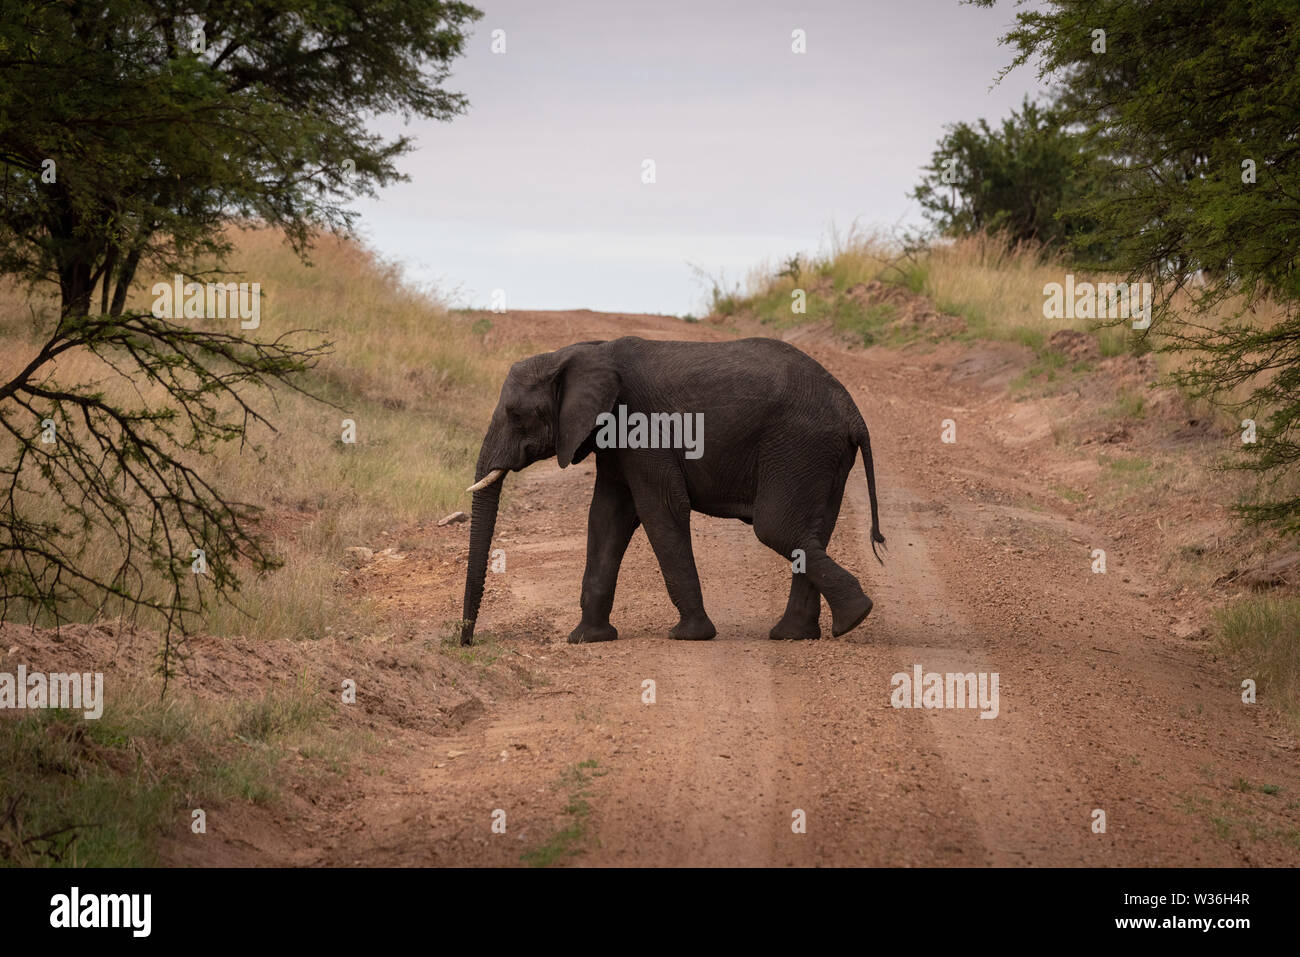 African elephant walks across track between trees - Stock Image